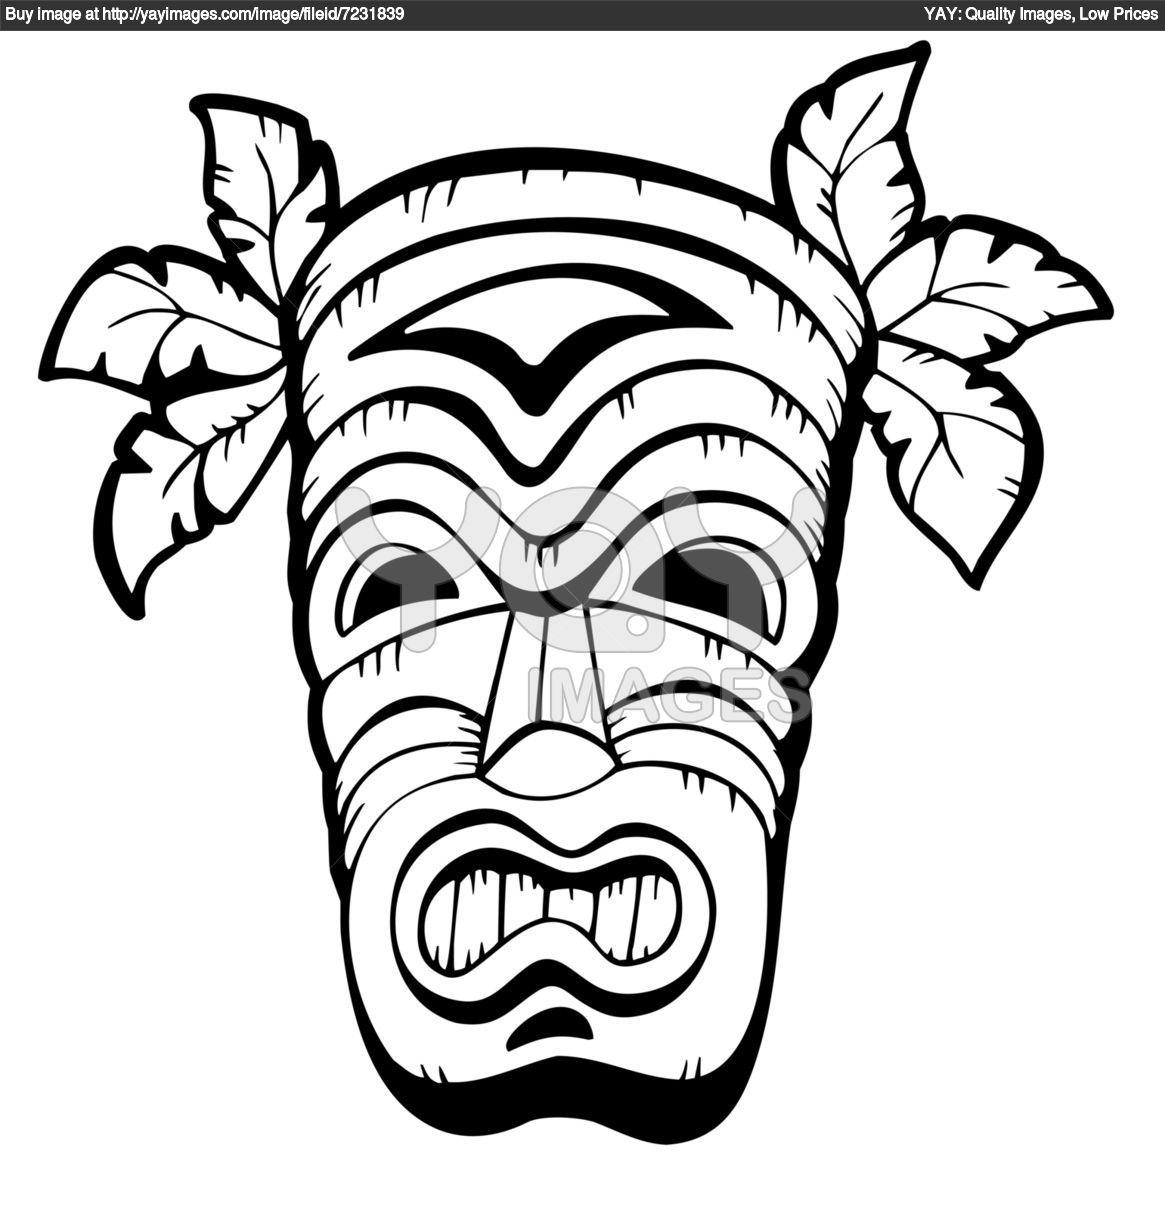 1165x1210 Hawaii Coloring Pages To Print Printable Hawaiian Coloring Pages